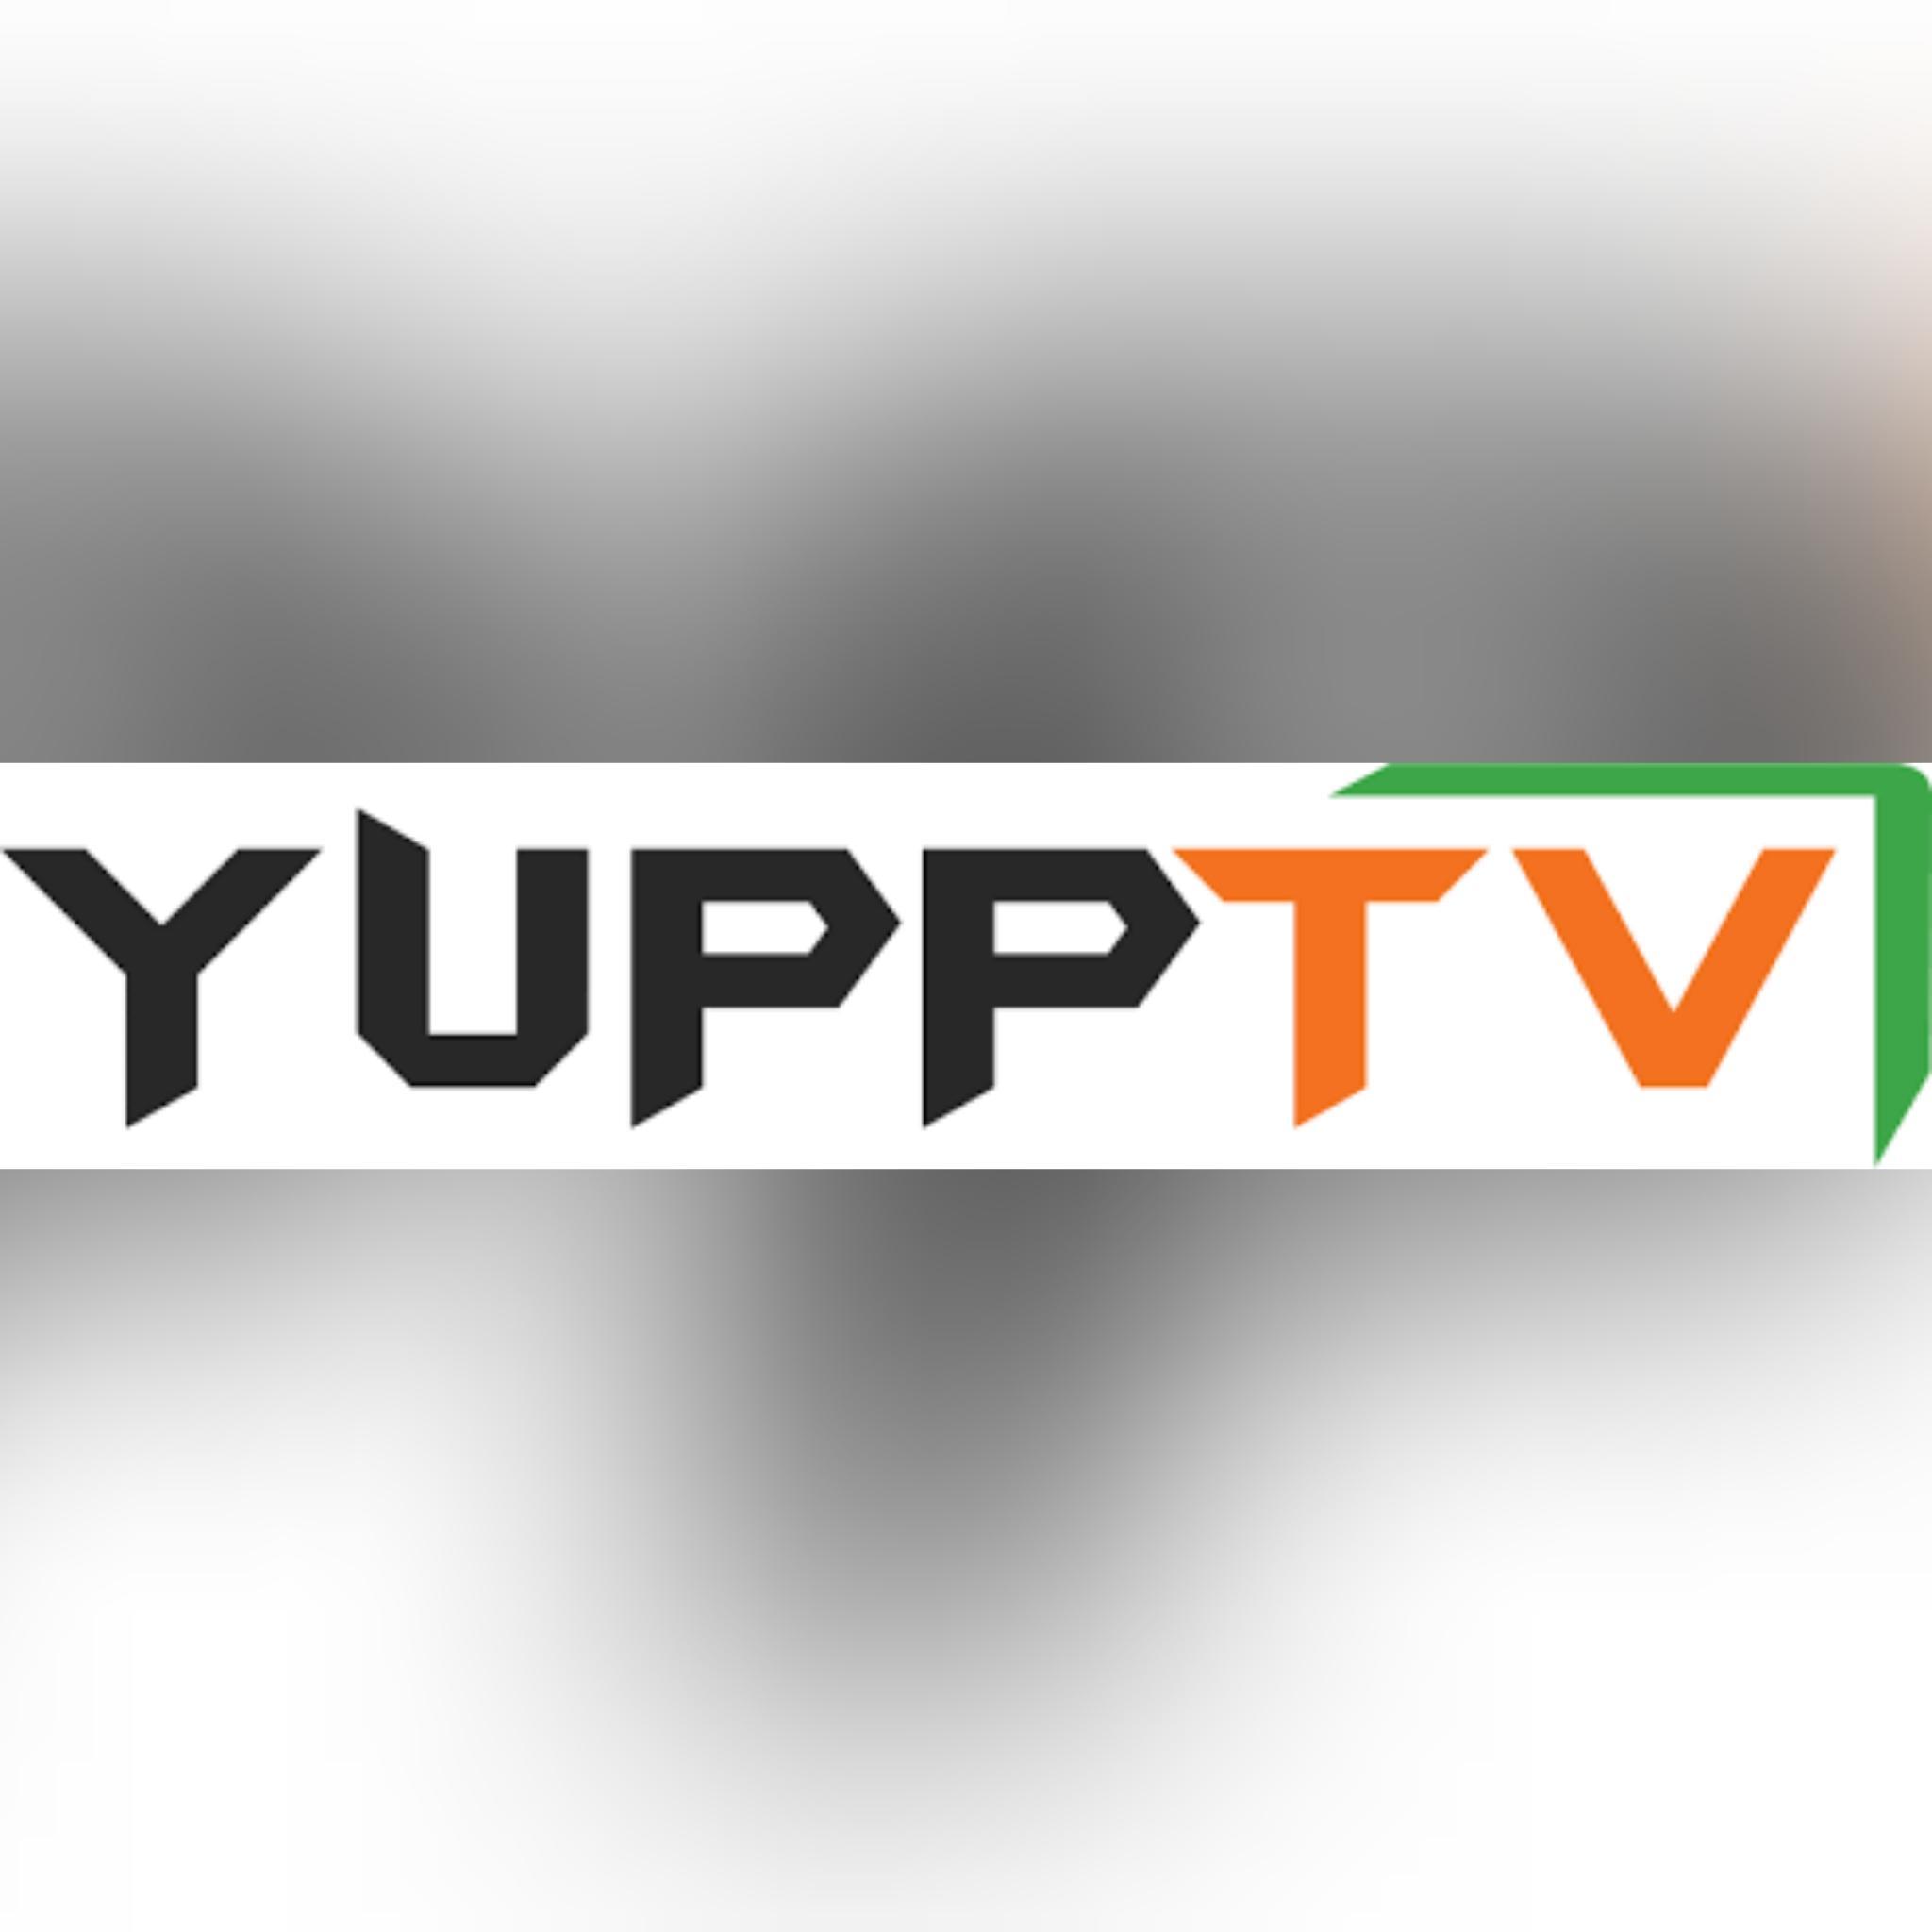 https://www.indiantelevision.com/sites/default/files/styles/smartcrop_800x800/public/images/tv-images/2021/06/30/photogrid_plus_1625053099832.jpg?itok=z6H-OMw-